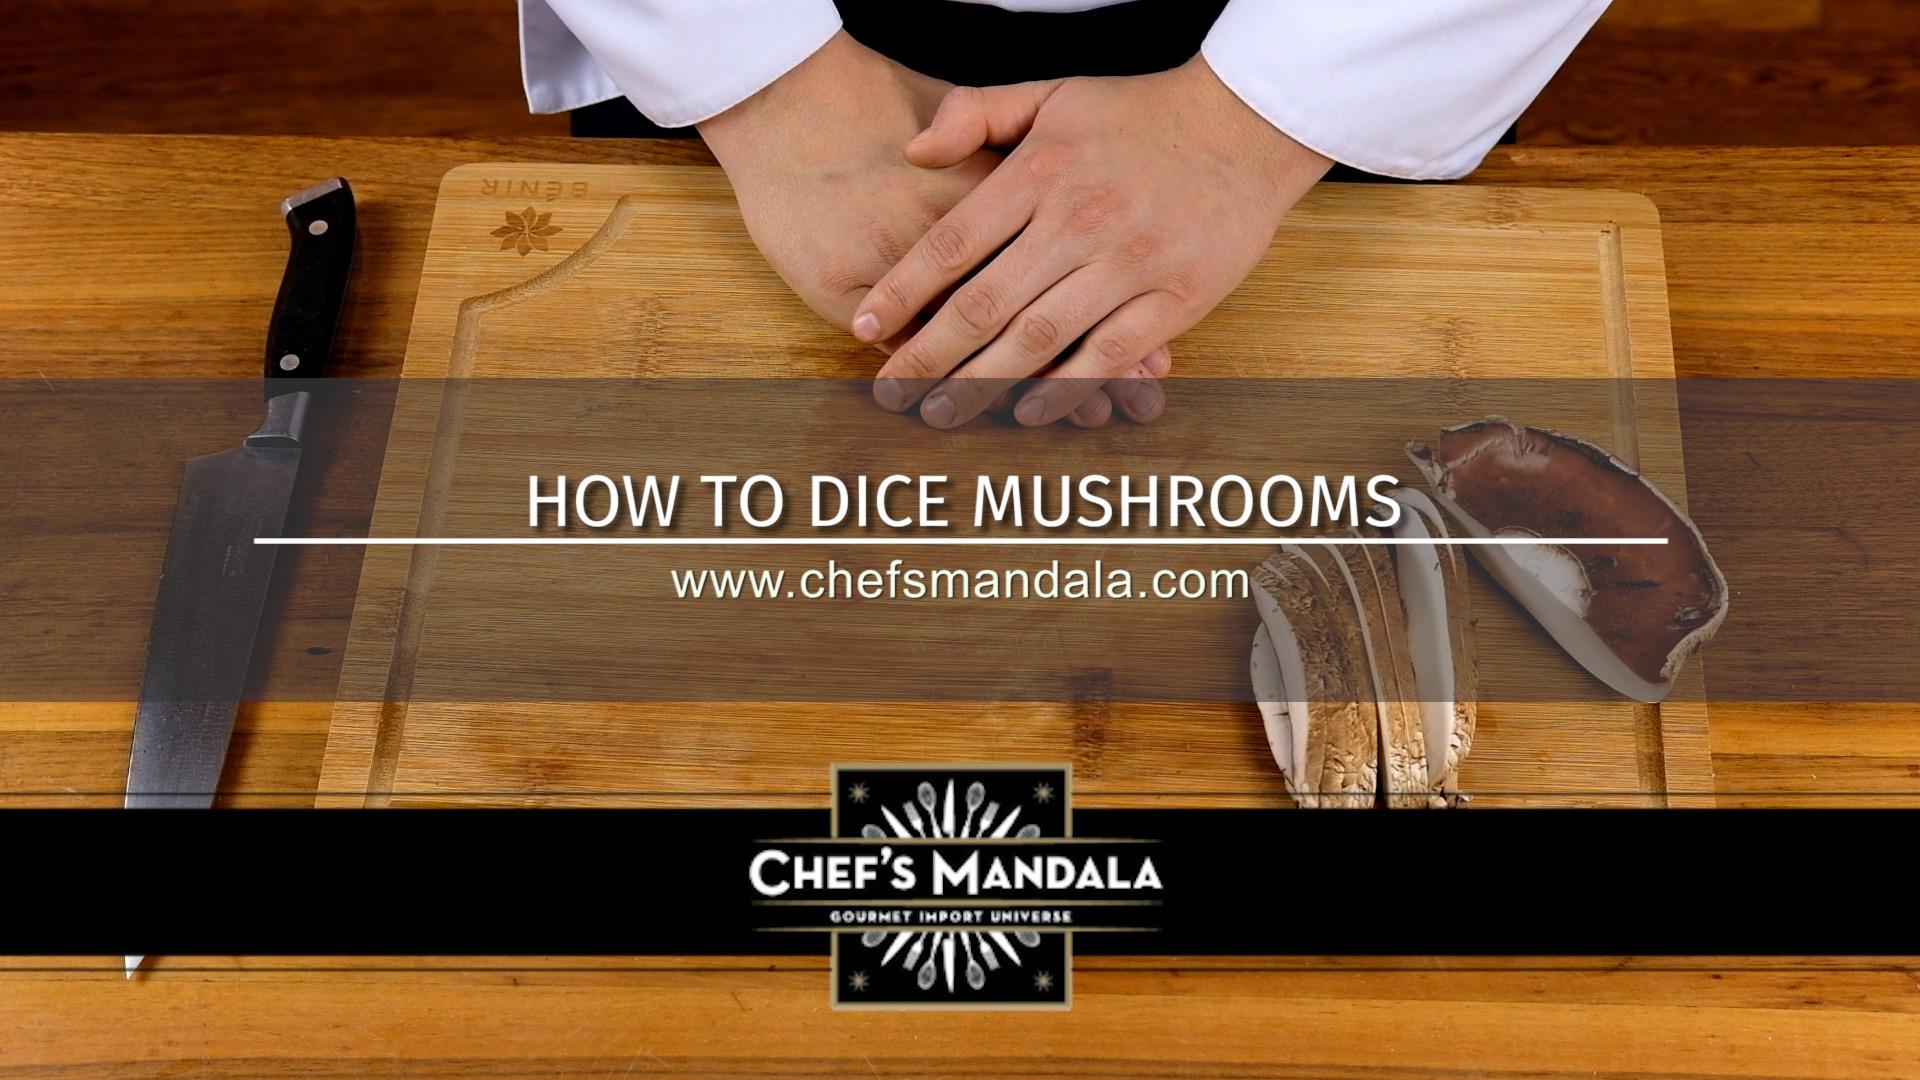 HOW TO DICE MUSHROOMS